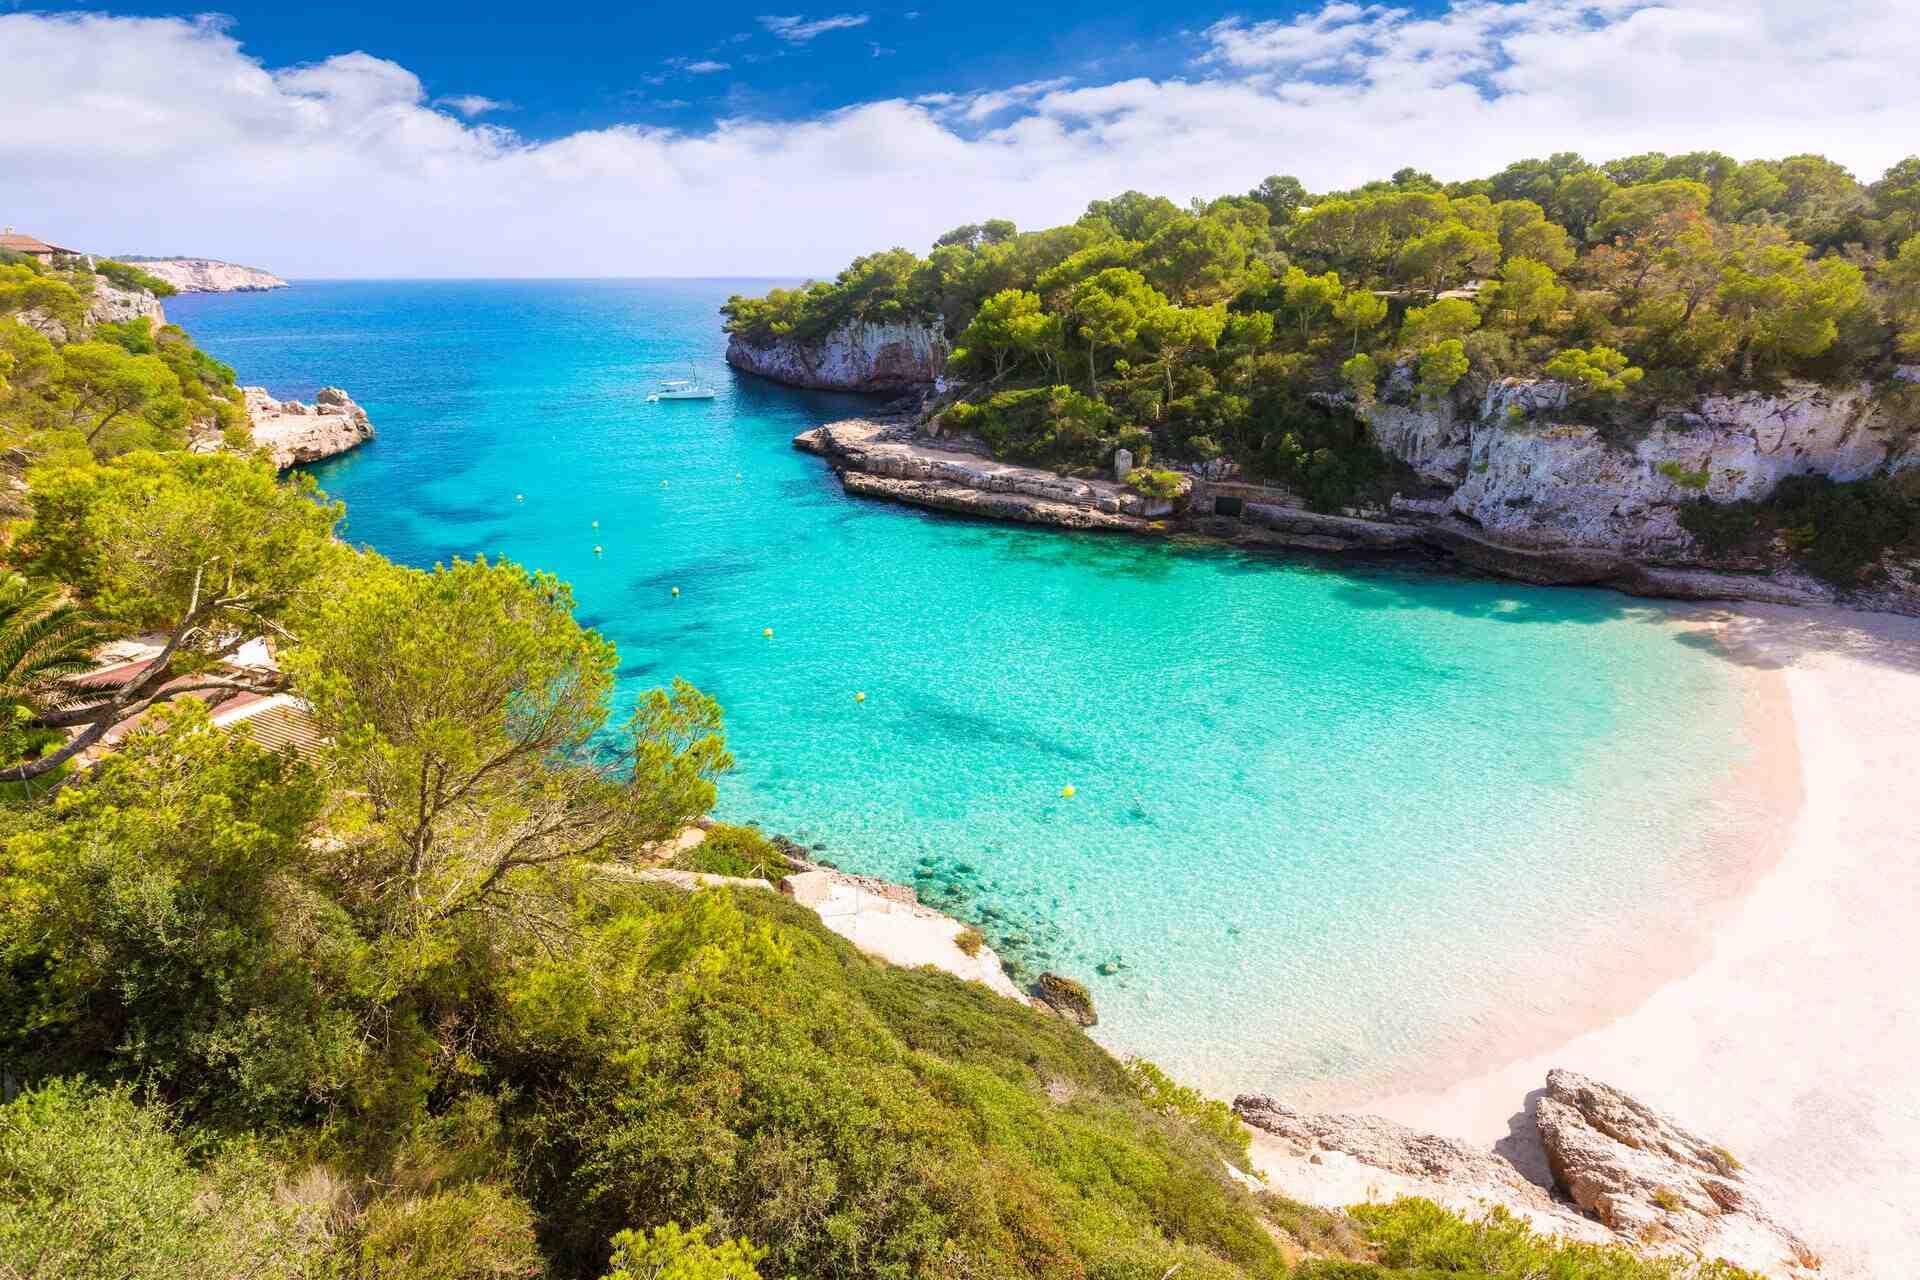 Où aller en Méditerranée?